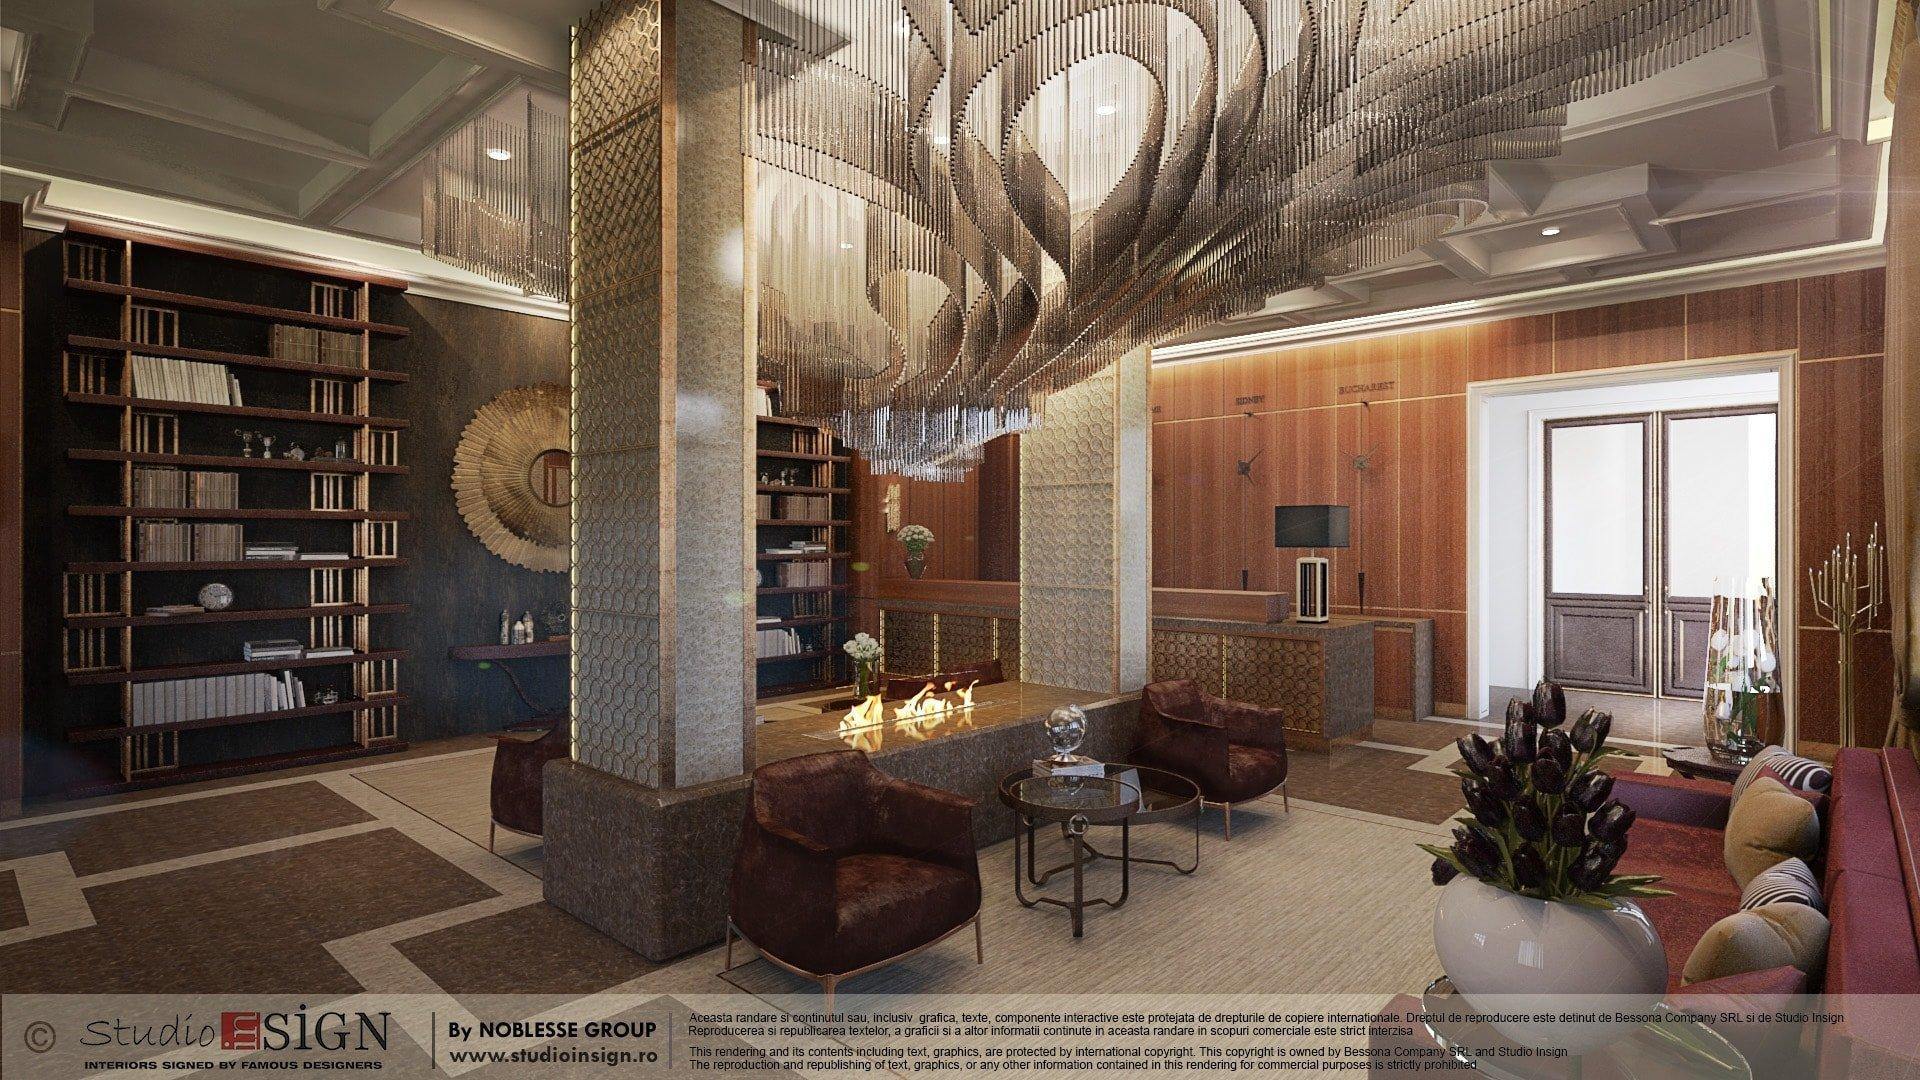 LOBBY & LOUNGE HOTEL, BRASOV – CLASSIC INTERIOR DESIGN   Studio inSIGN